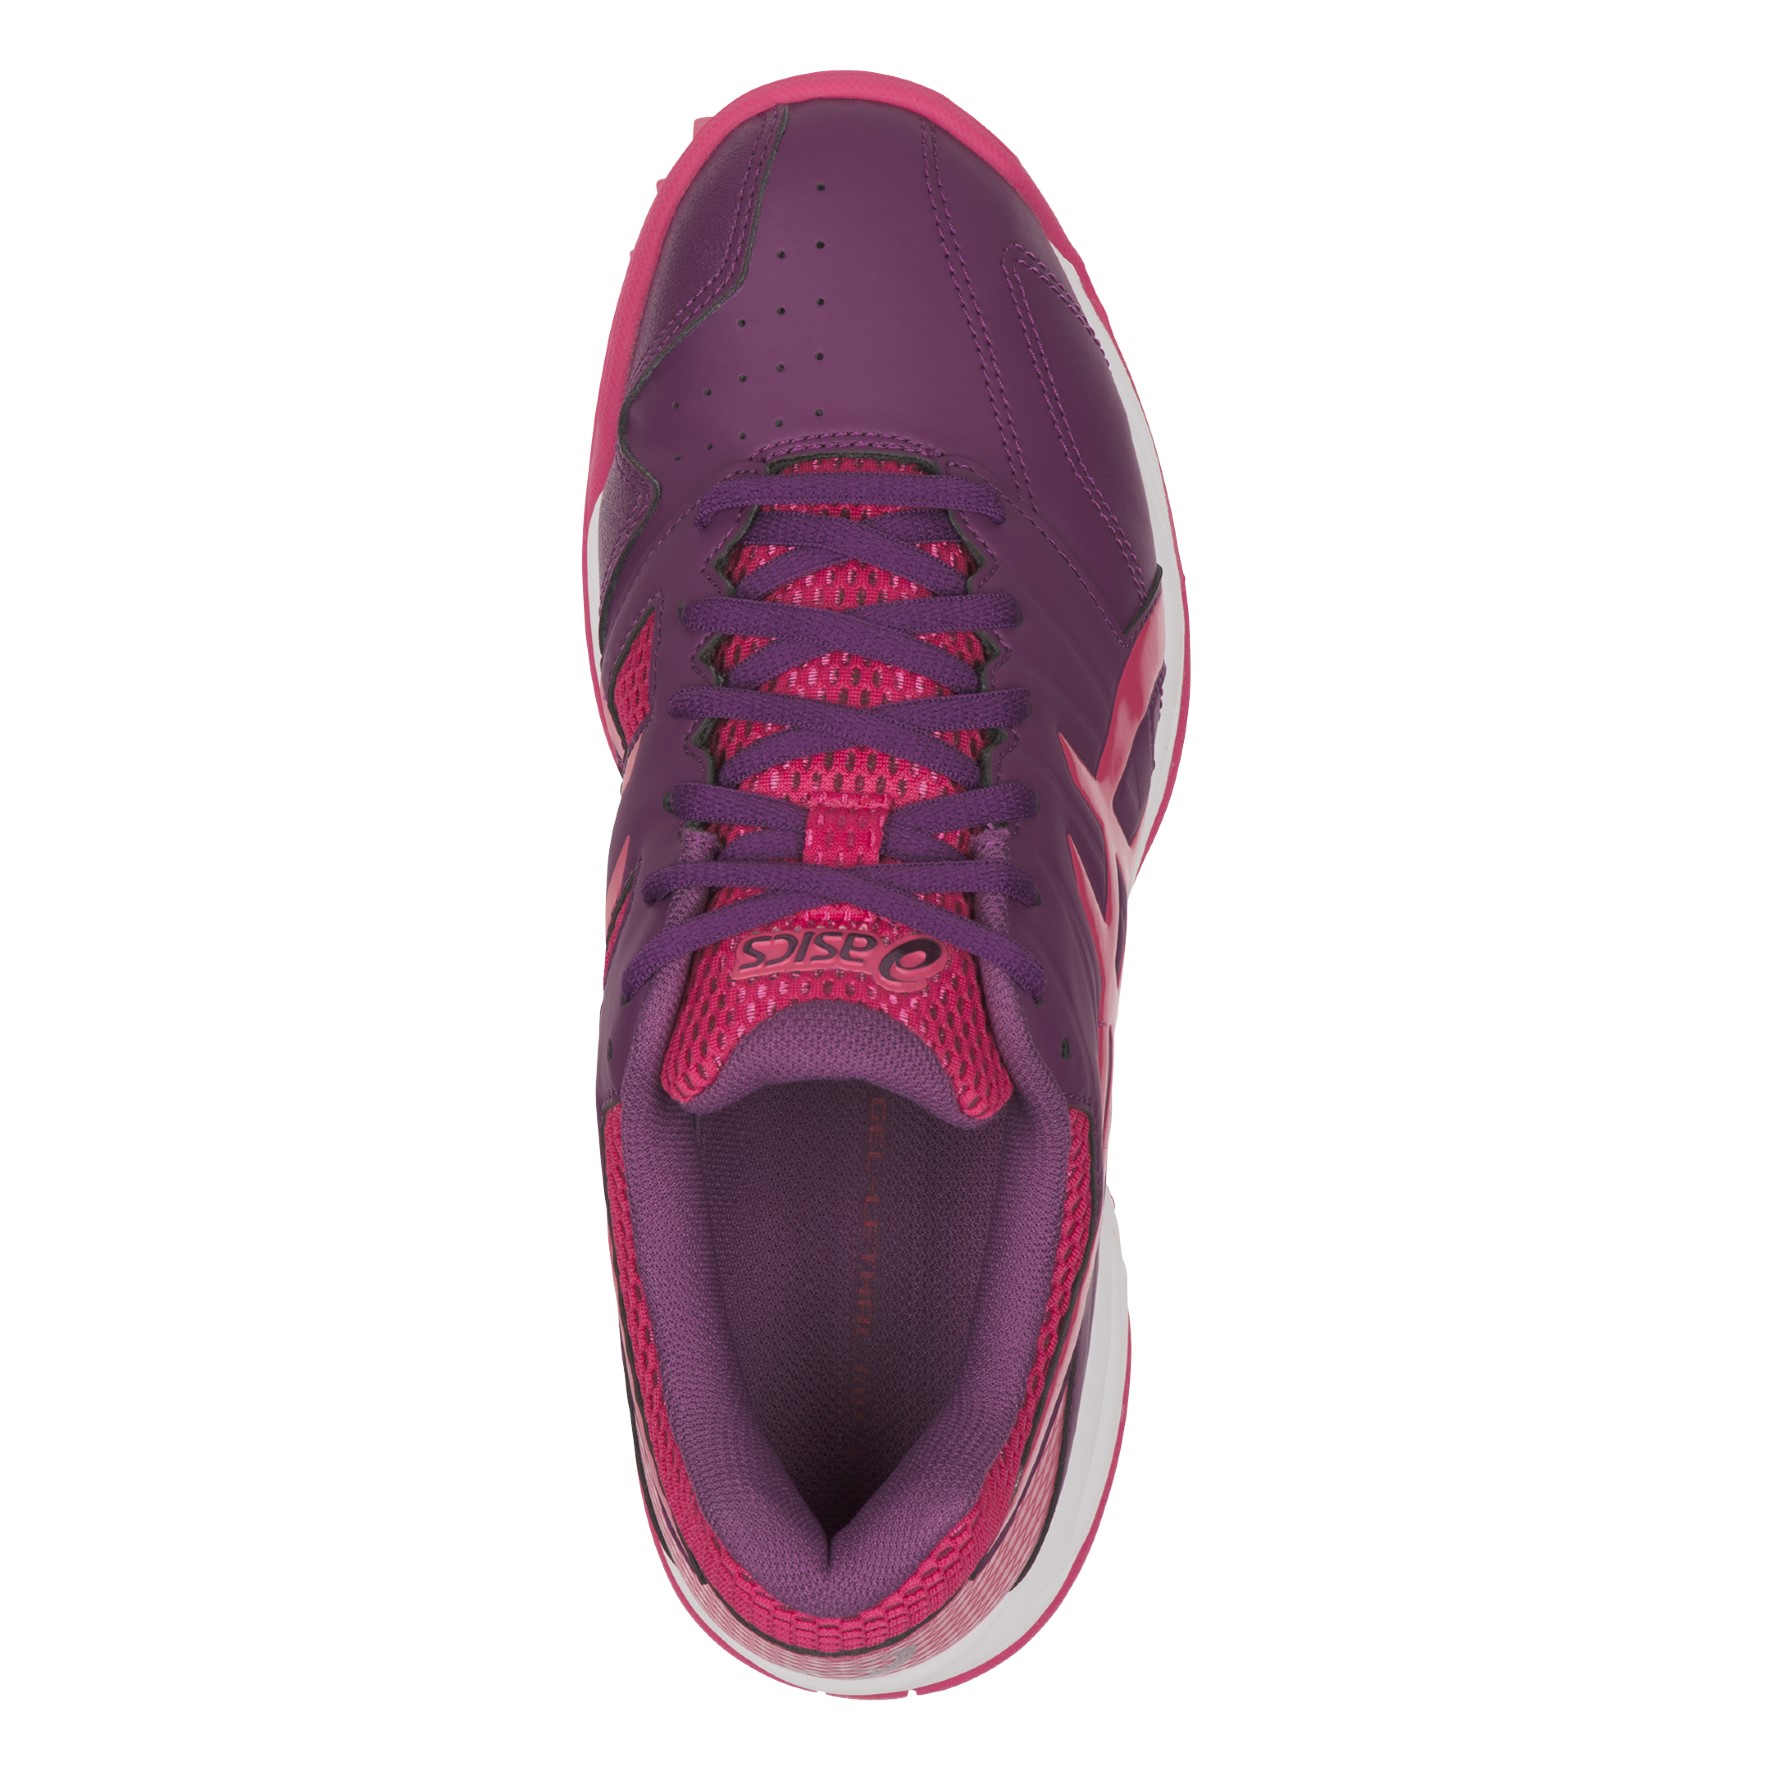 Chaussures De Hockey Asics Taille 11 L9p8gGH2ak